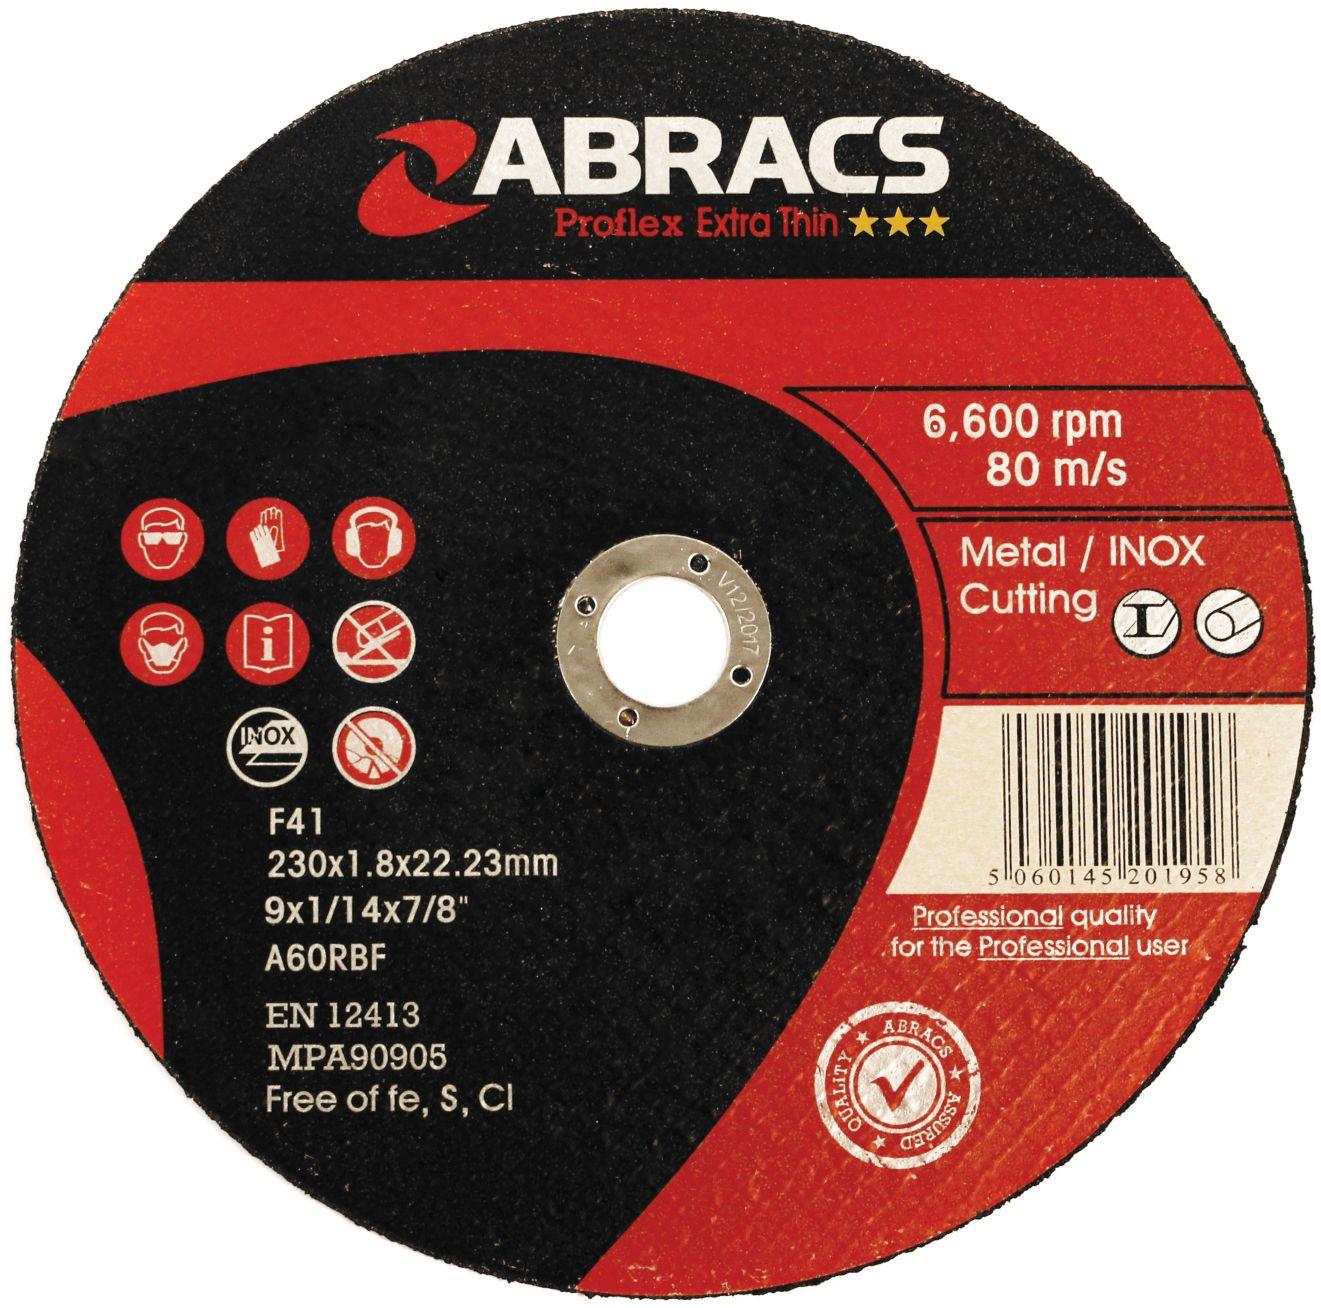 THIN METAL CUTTING DISC - FLAT 125 X 1.0 X 22.23MM